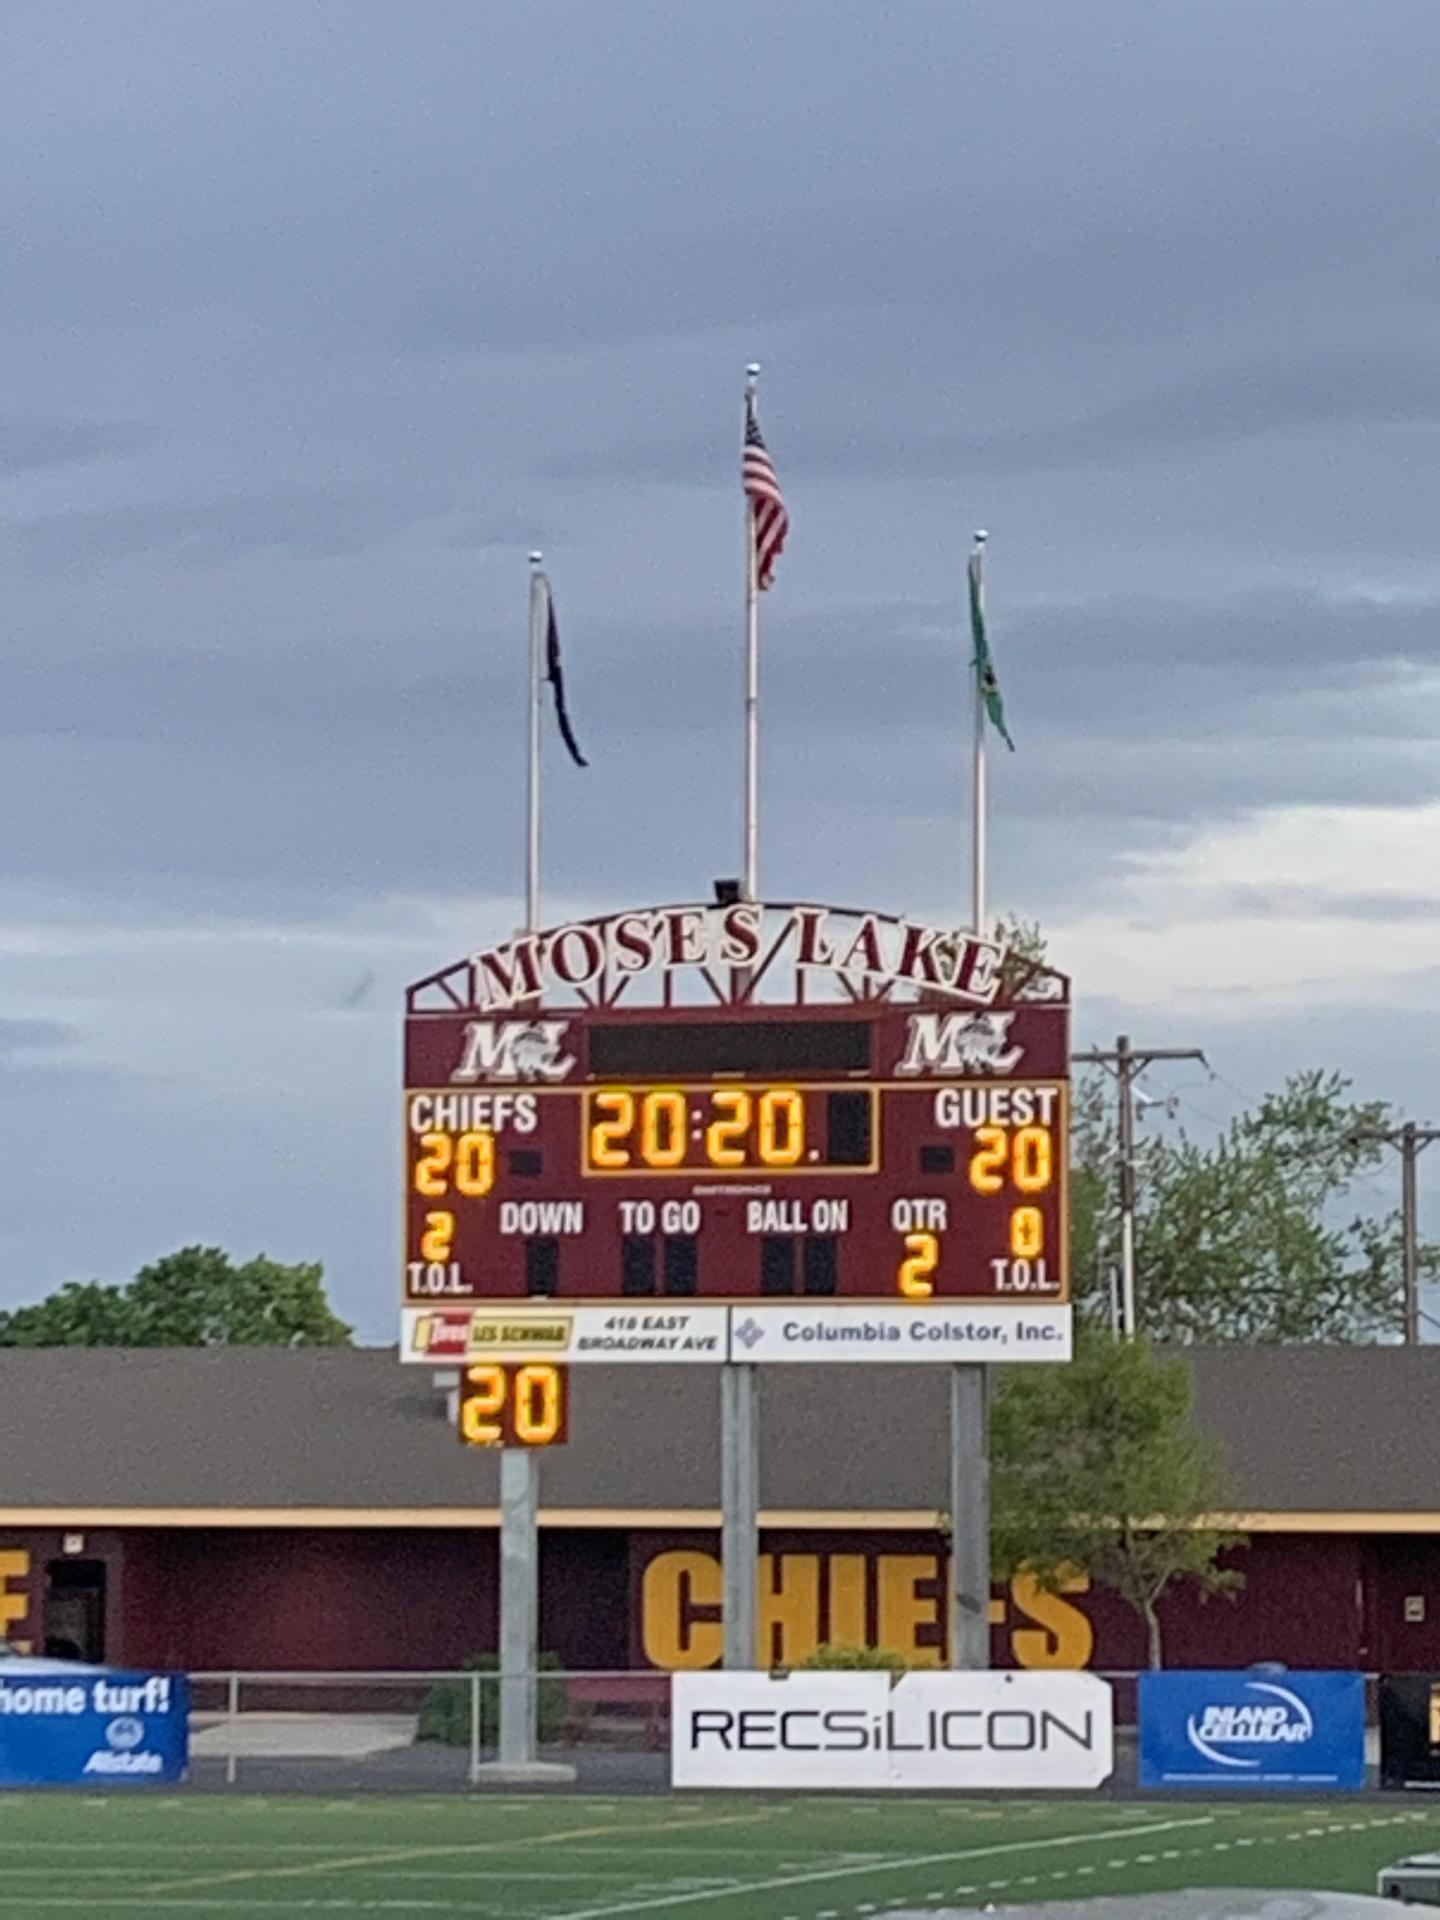 Picture of scoreboard